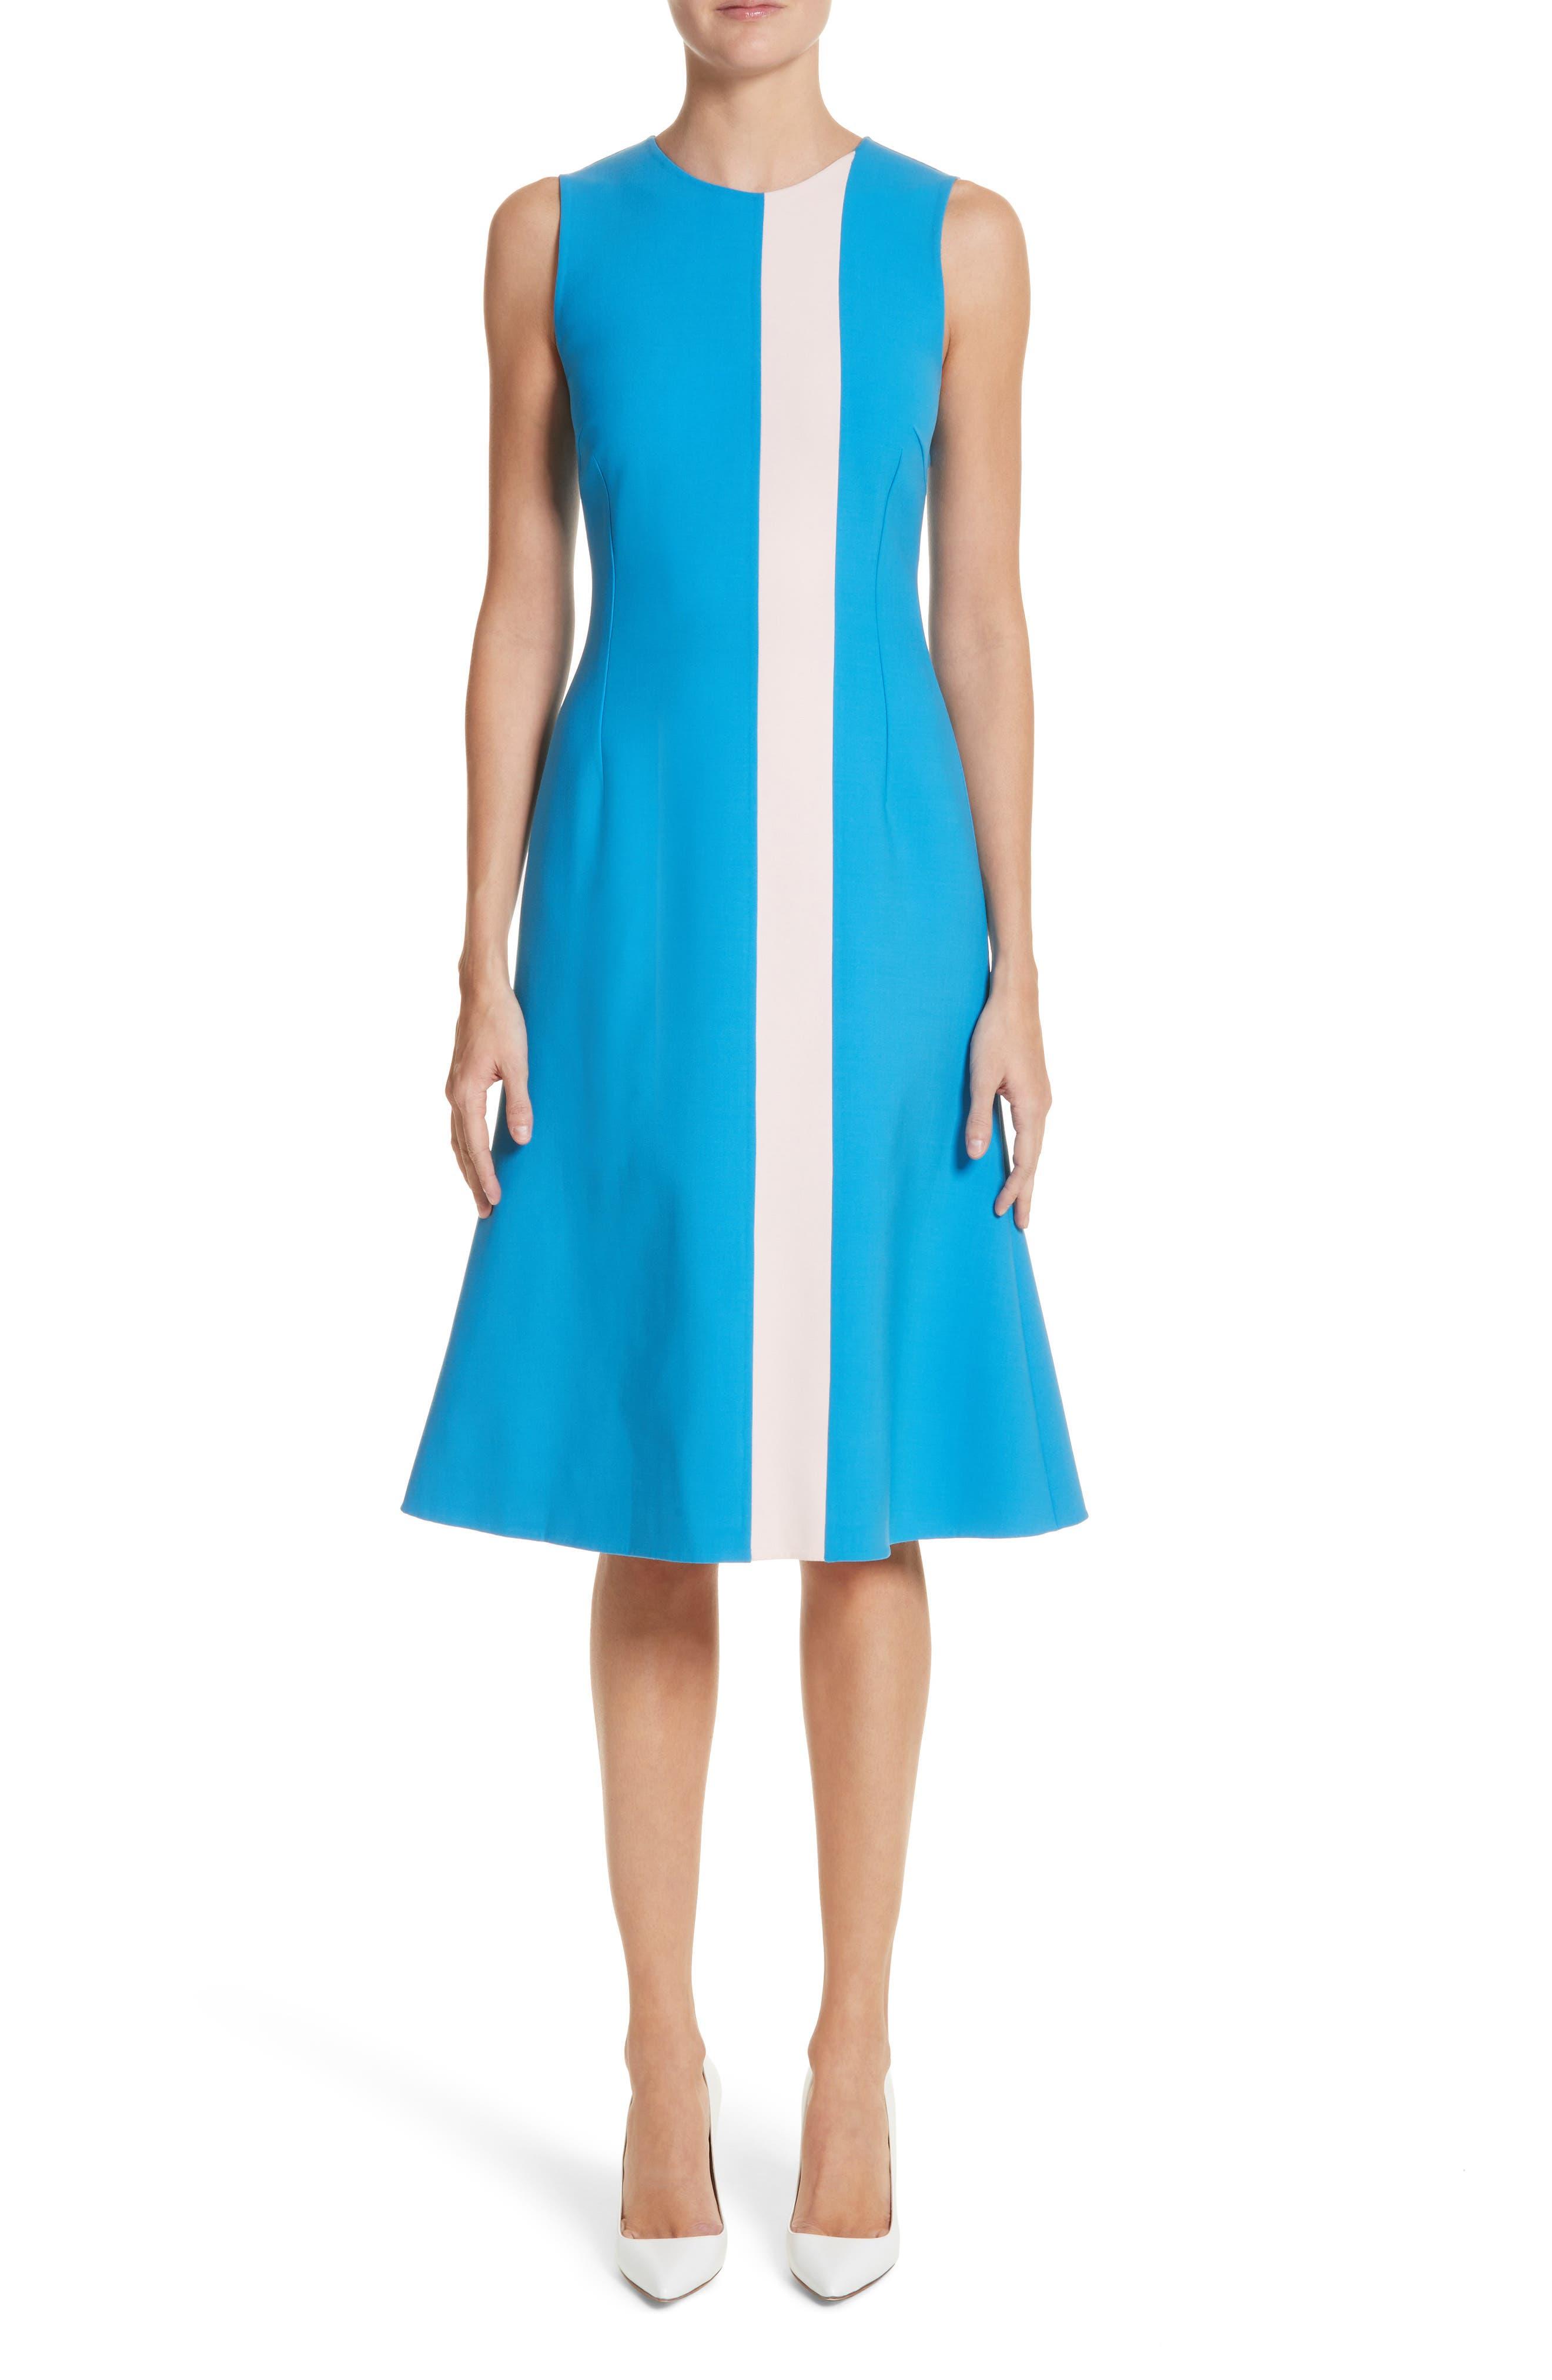 Main Image - Carolina Herrera Vertical Stripe Dress